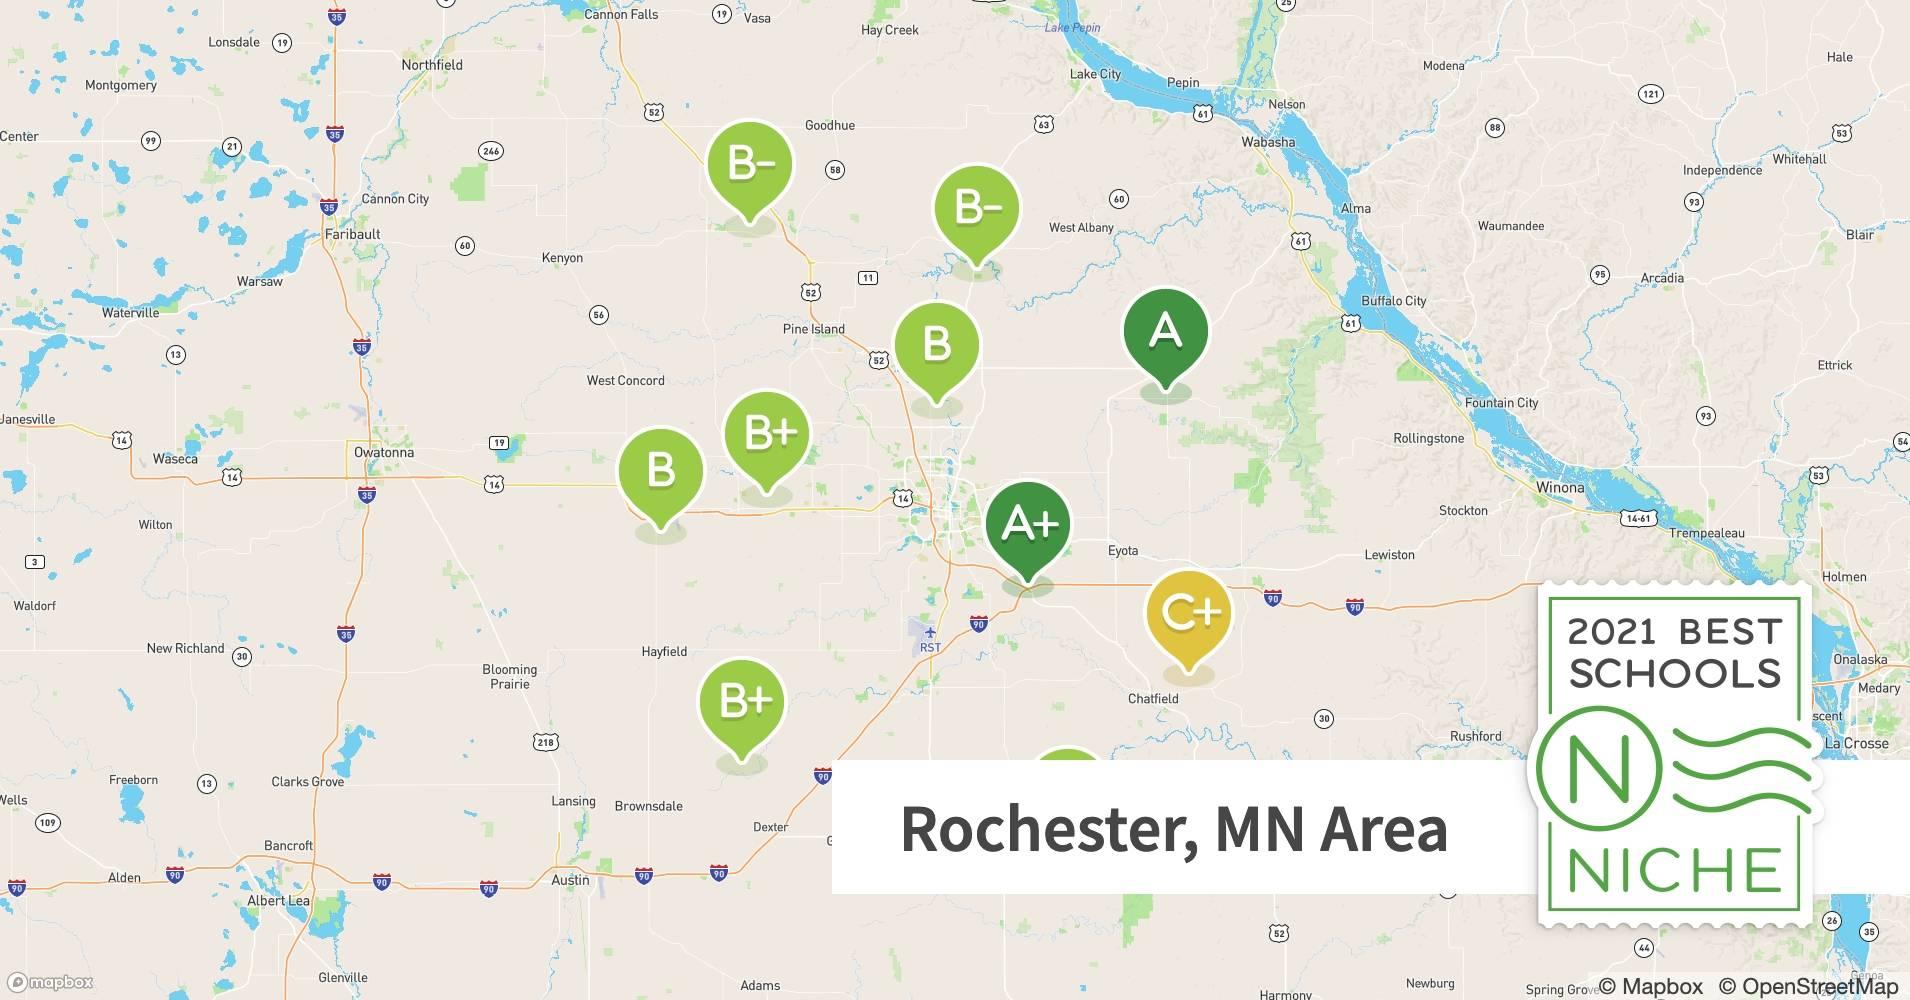 2021 Best Public High Schools In The Rochester Mn Area Niche